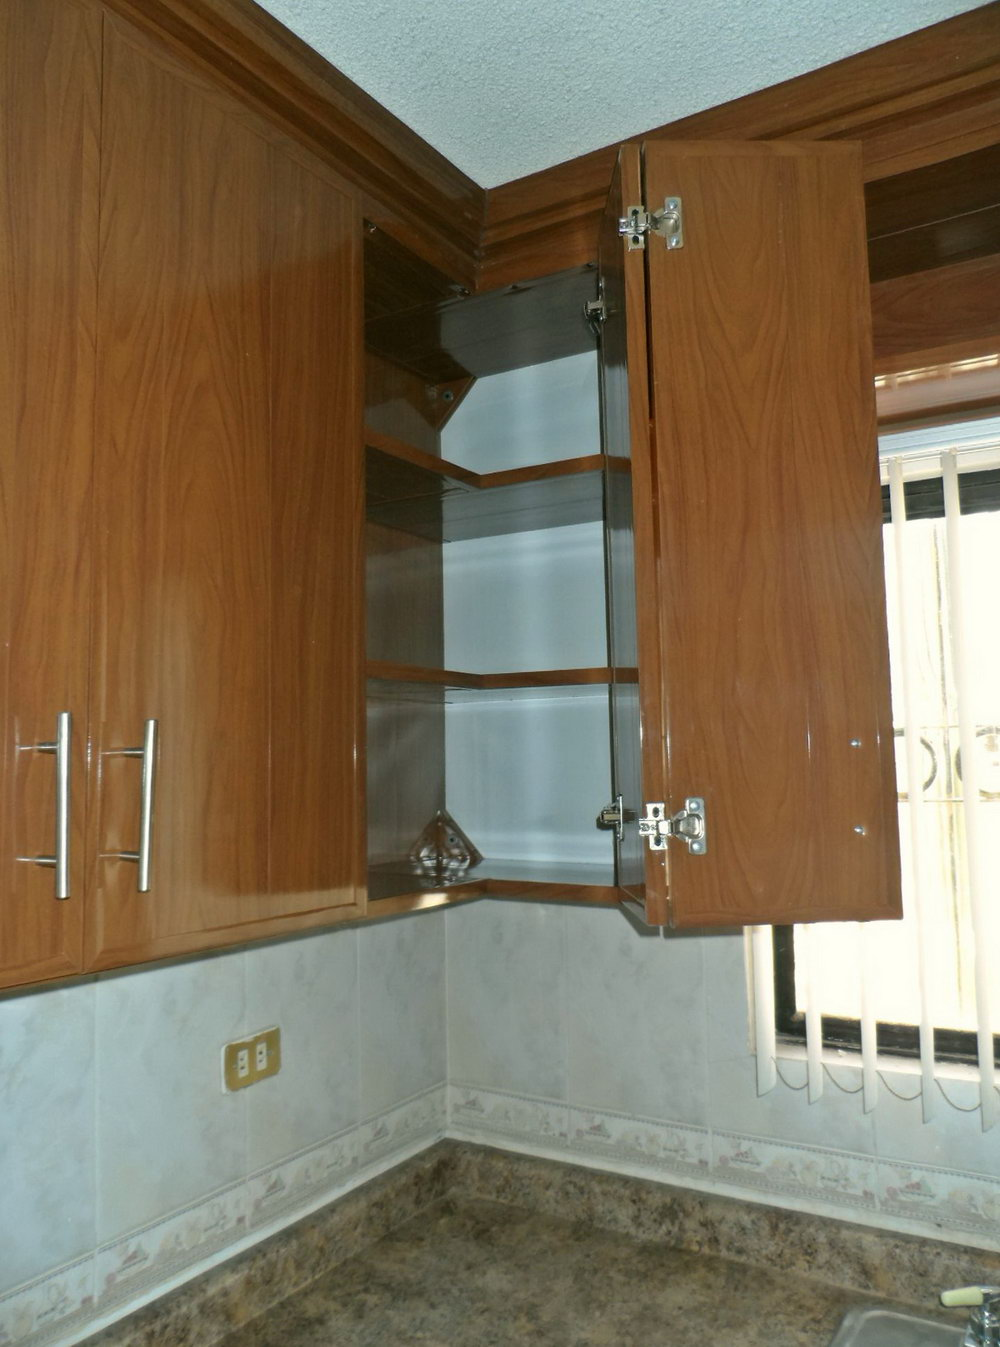 Plastic Shelf Supports Kitchen Cabinets